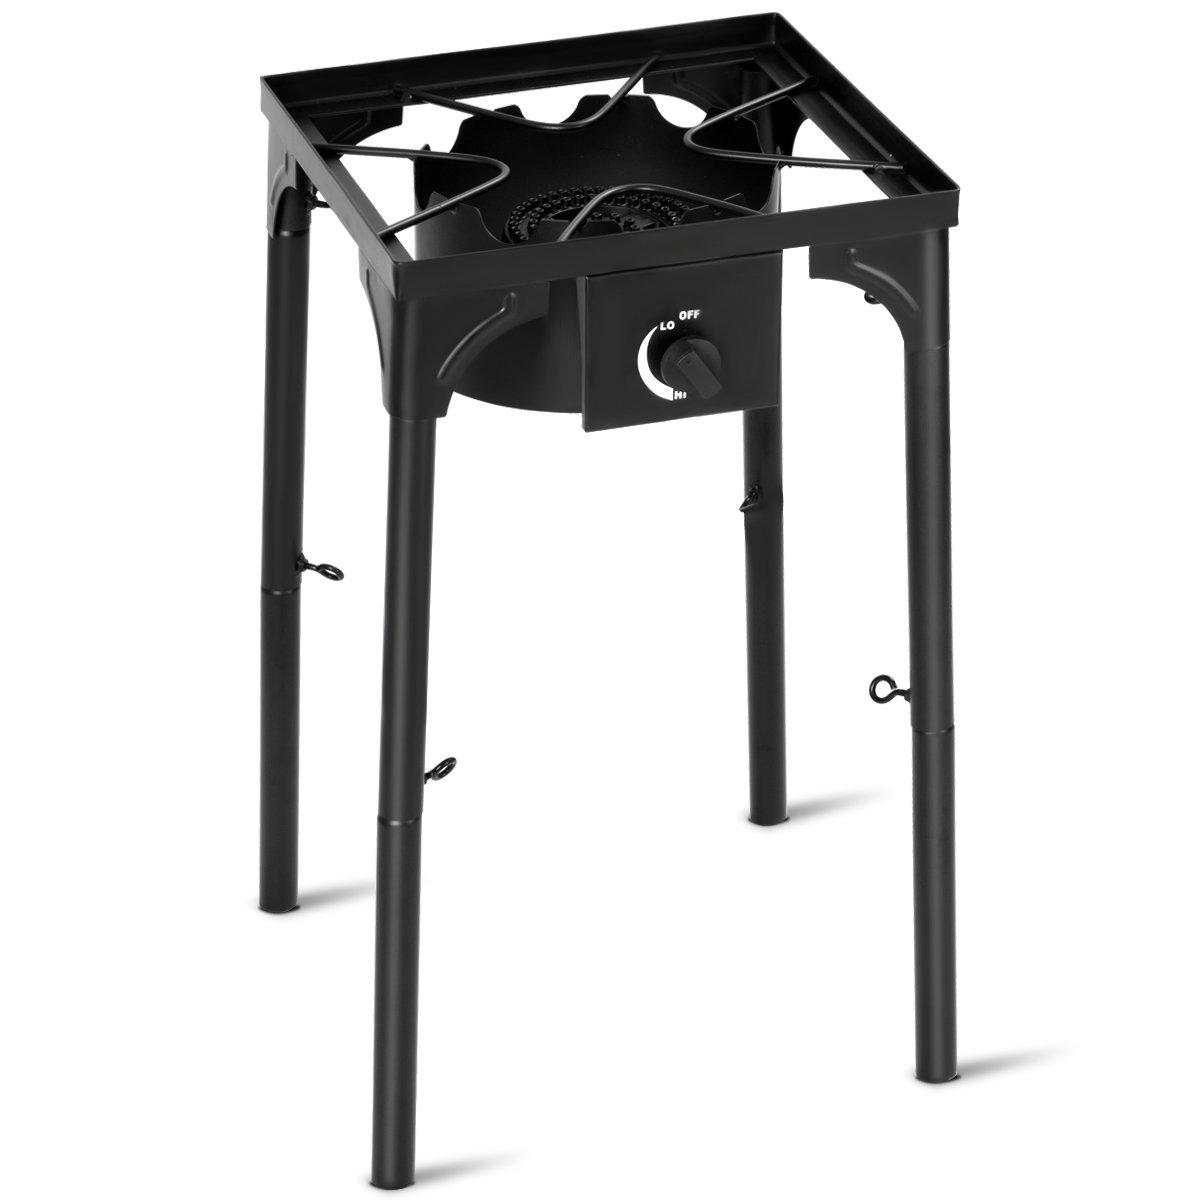 Giantex Portable Propane 100,000-BTU Single Burner Outdoor Stove Cooker Standing Camping Cooking Stove w/CSA Listed High Pressure Regulator, Hose, Adjustable Legs